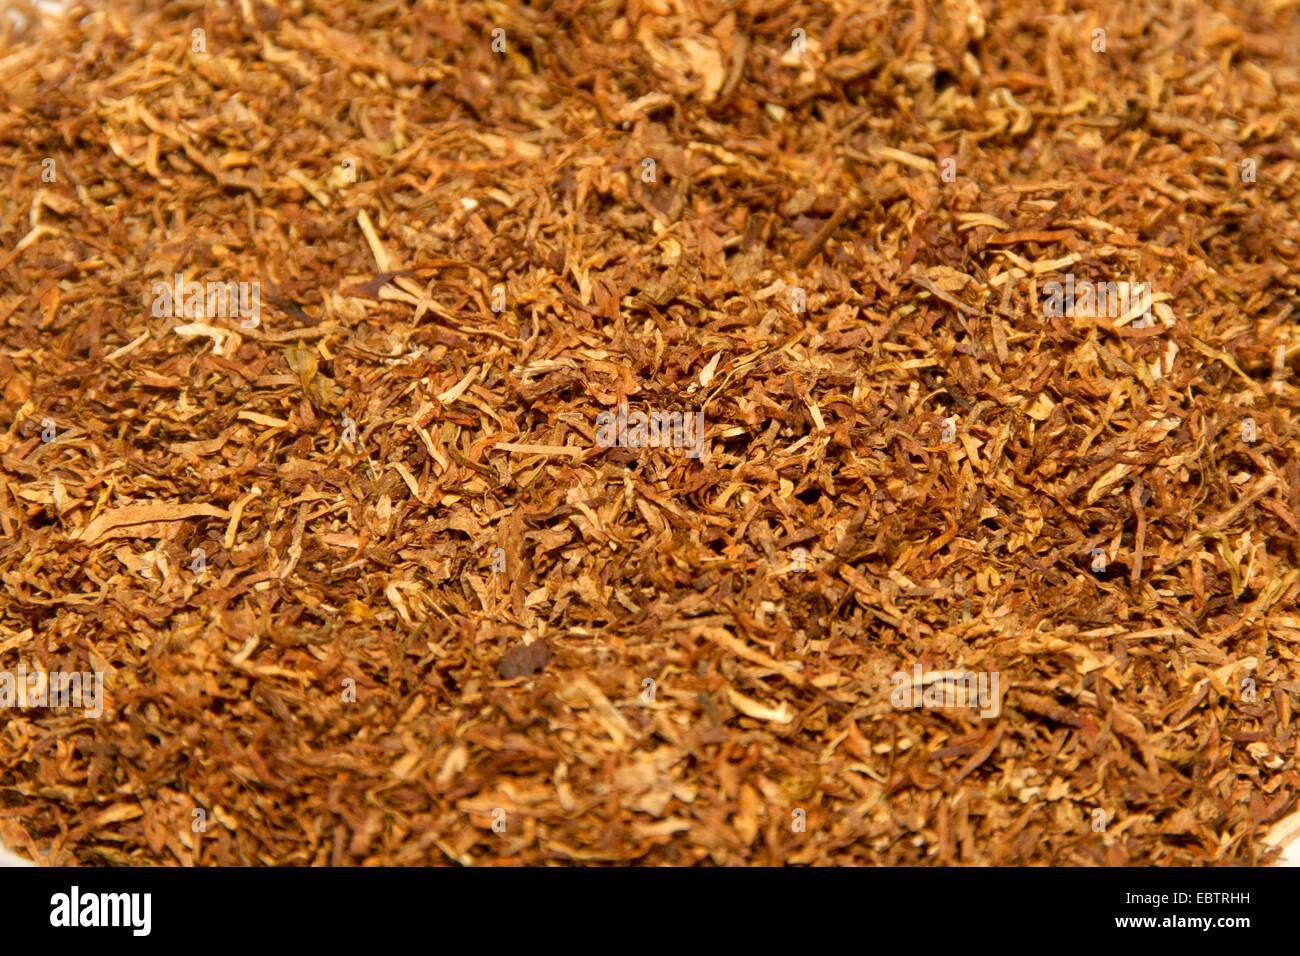 American Blend tobacco, Germany, North Rhine-Westphalia - Stock Image